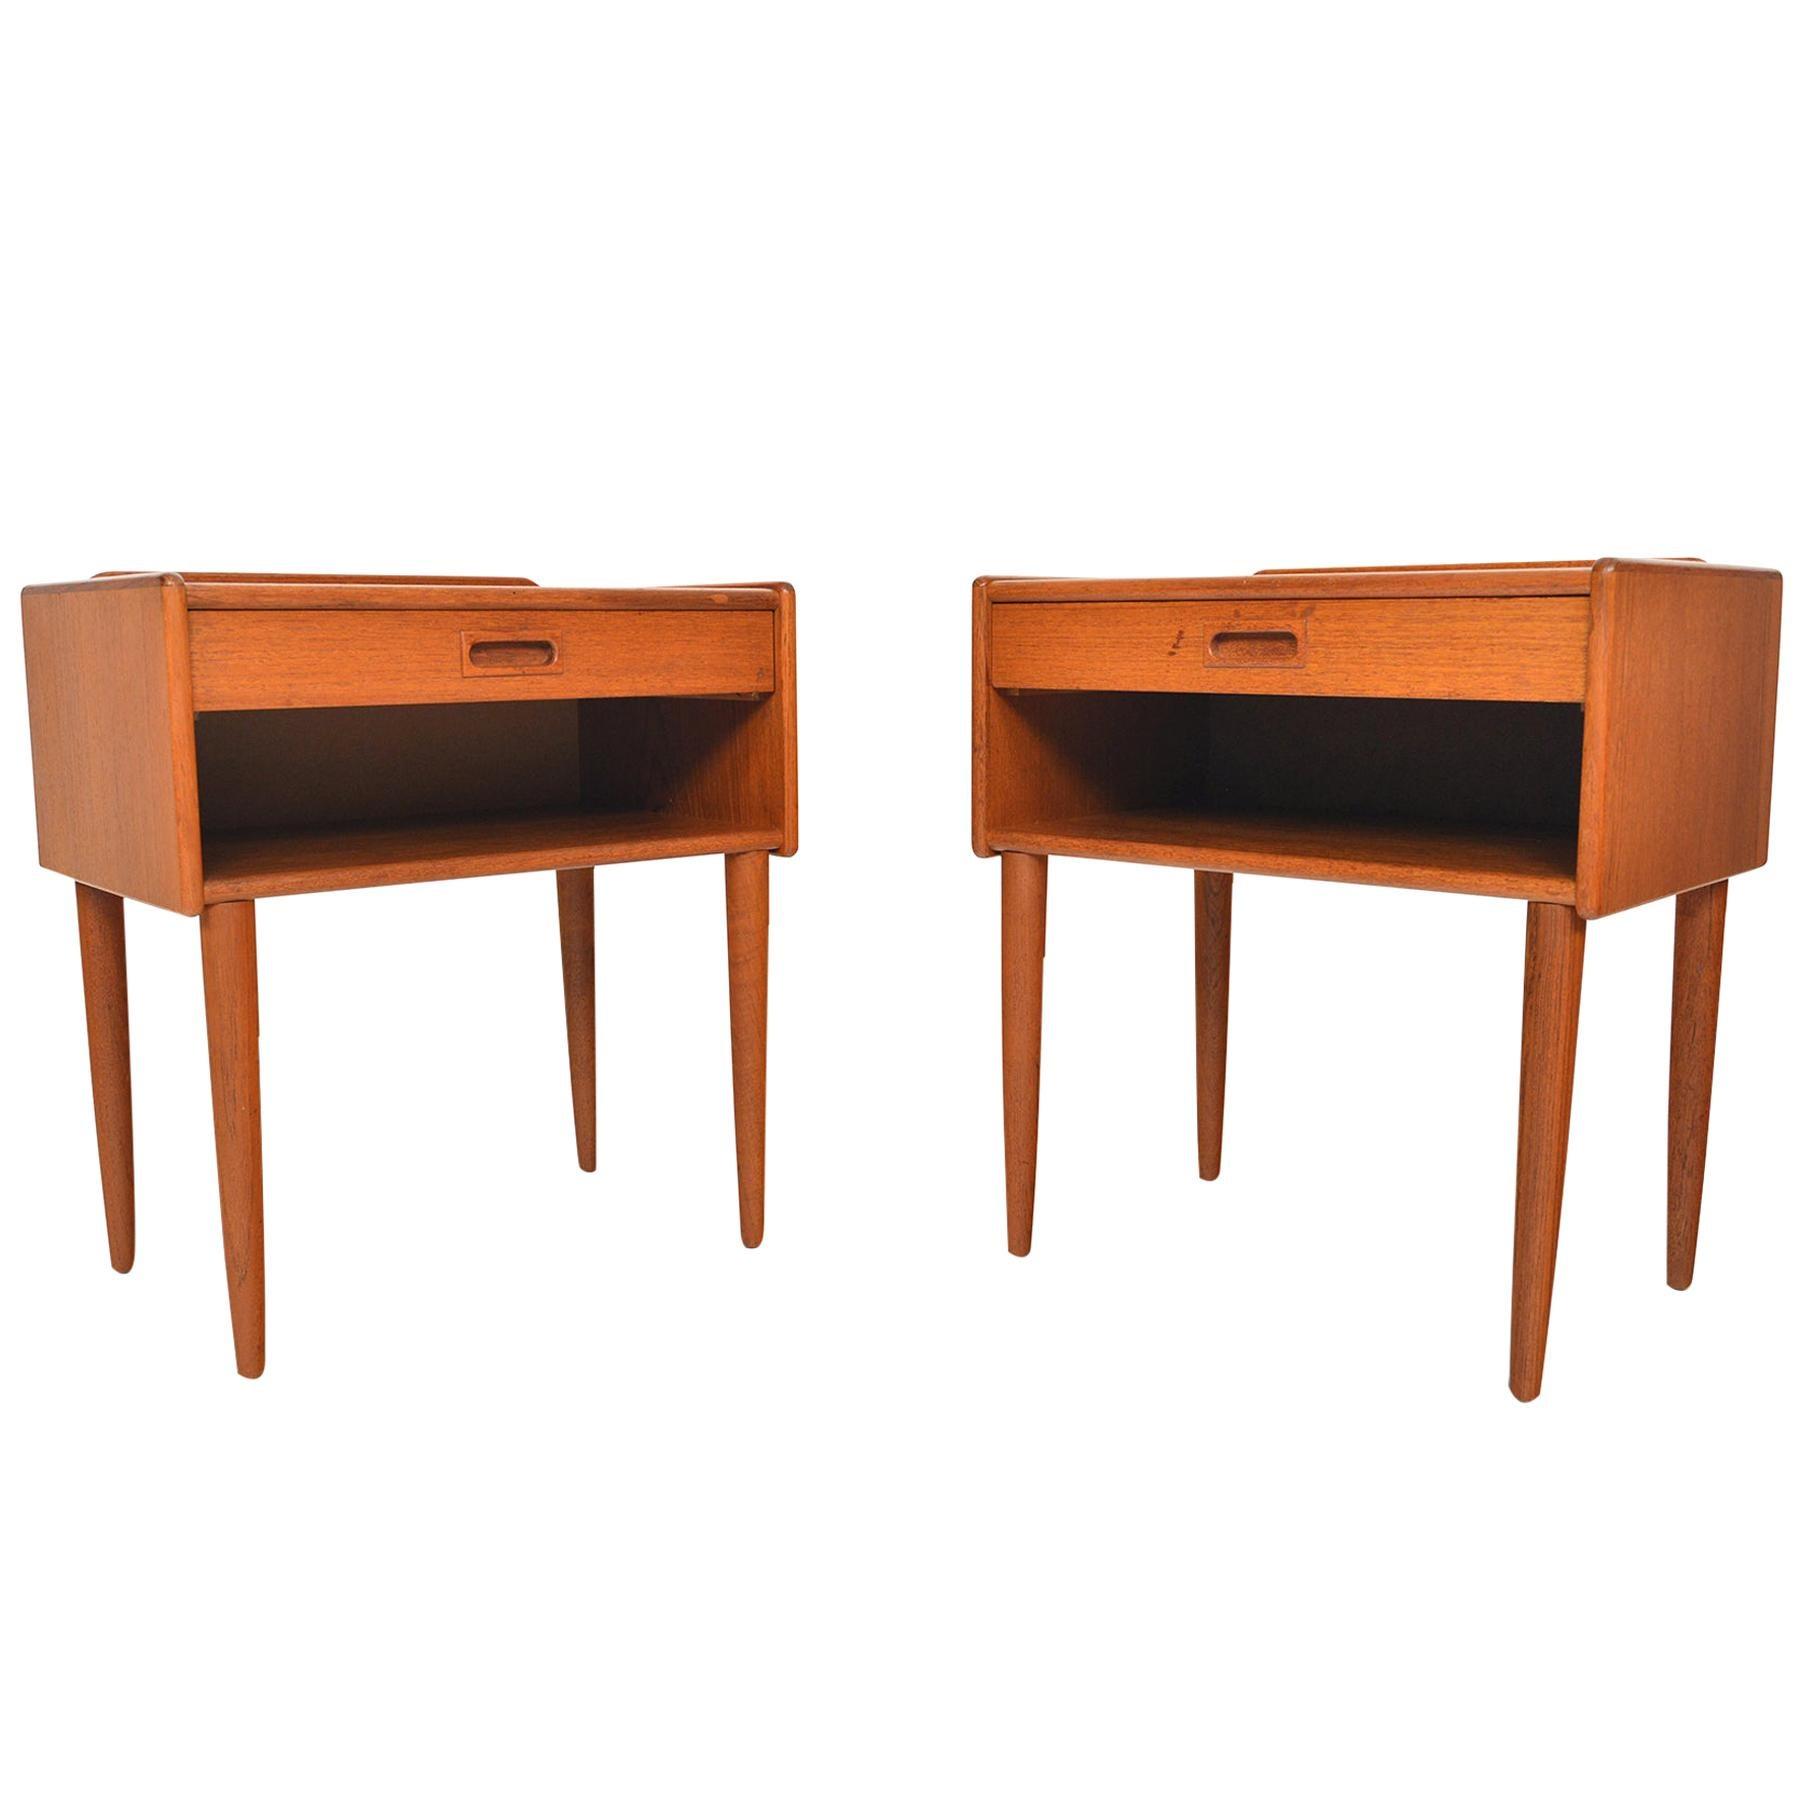 Pair of Danish Modern Single Drawer Teak Nightstands